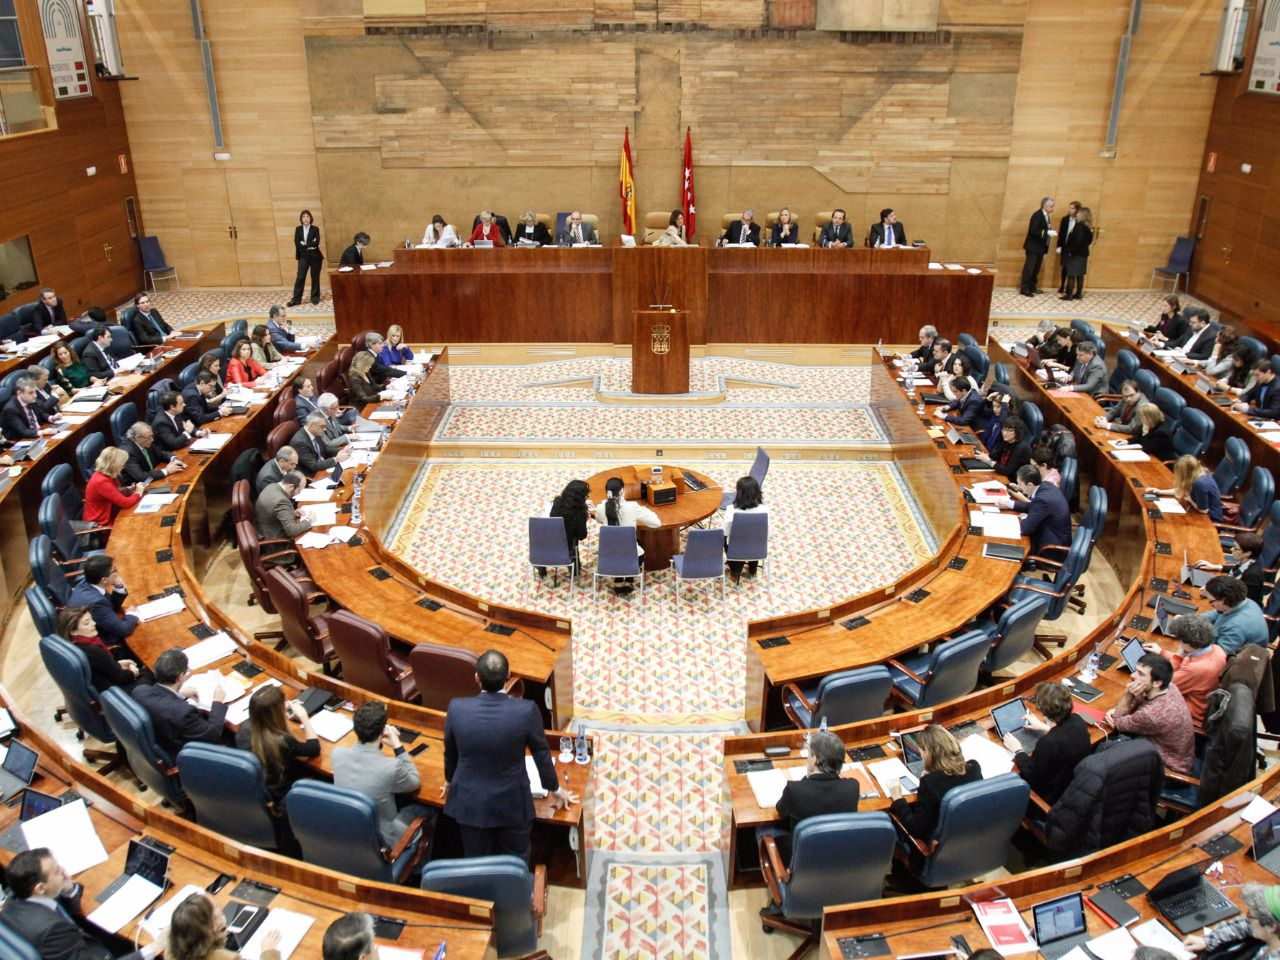 La asamblea tramitar una iniciativa para proteger a funcionarios que denuncian la corrupci n - Casos de corrupcion de podemos ...